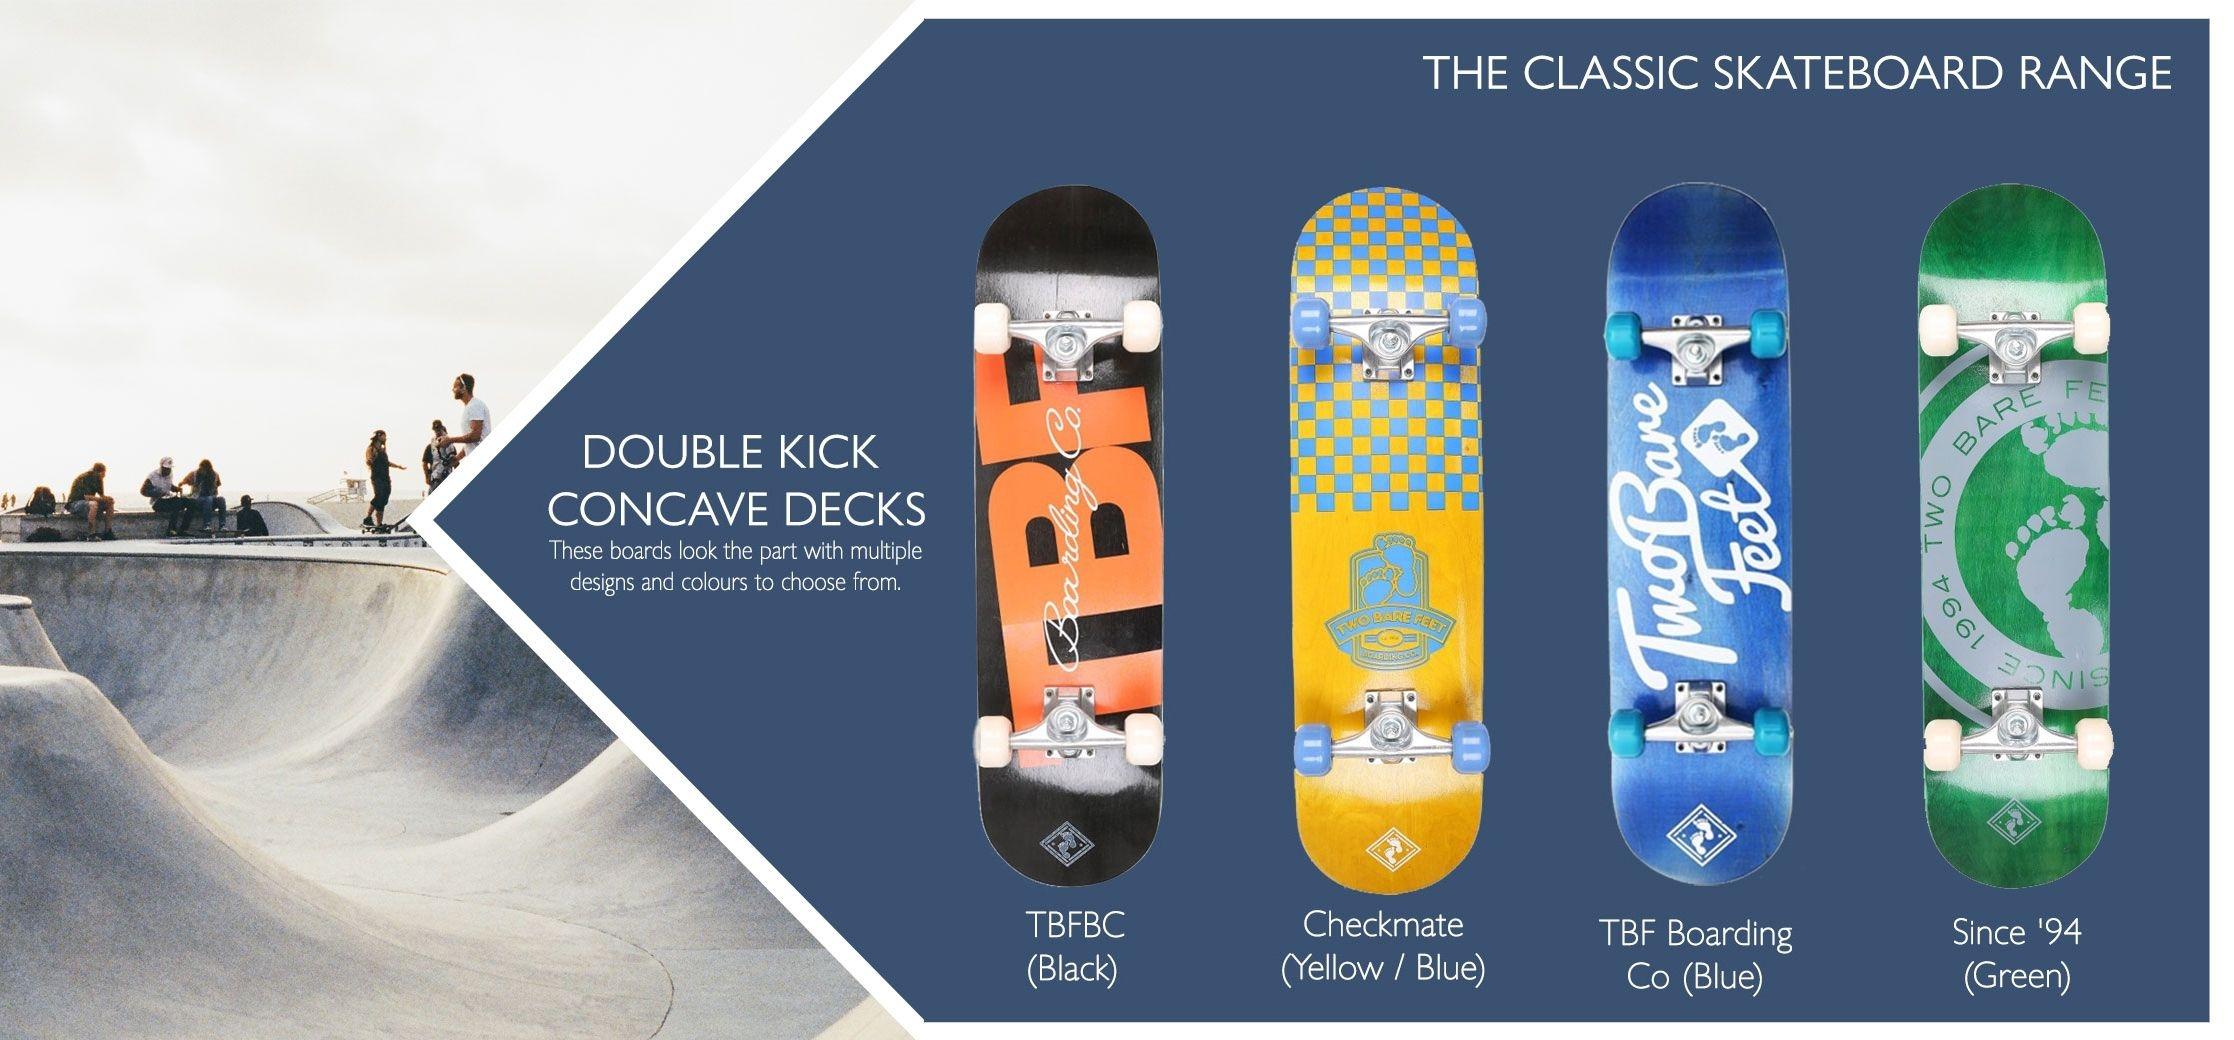 Classic skateboard info insert